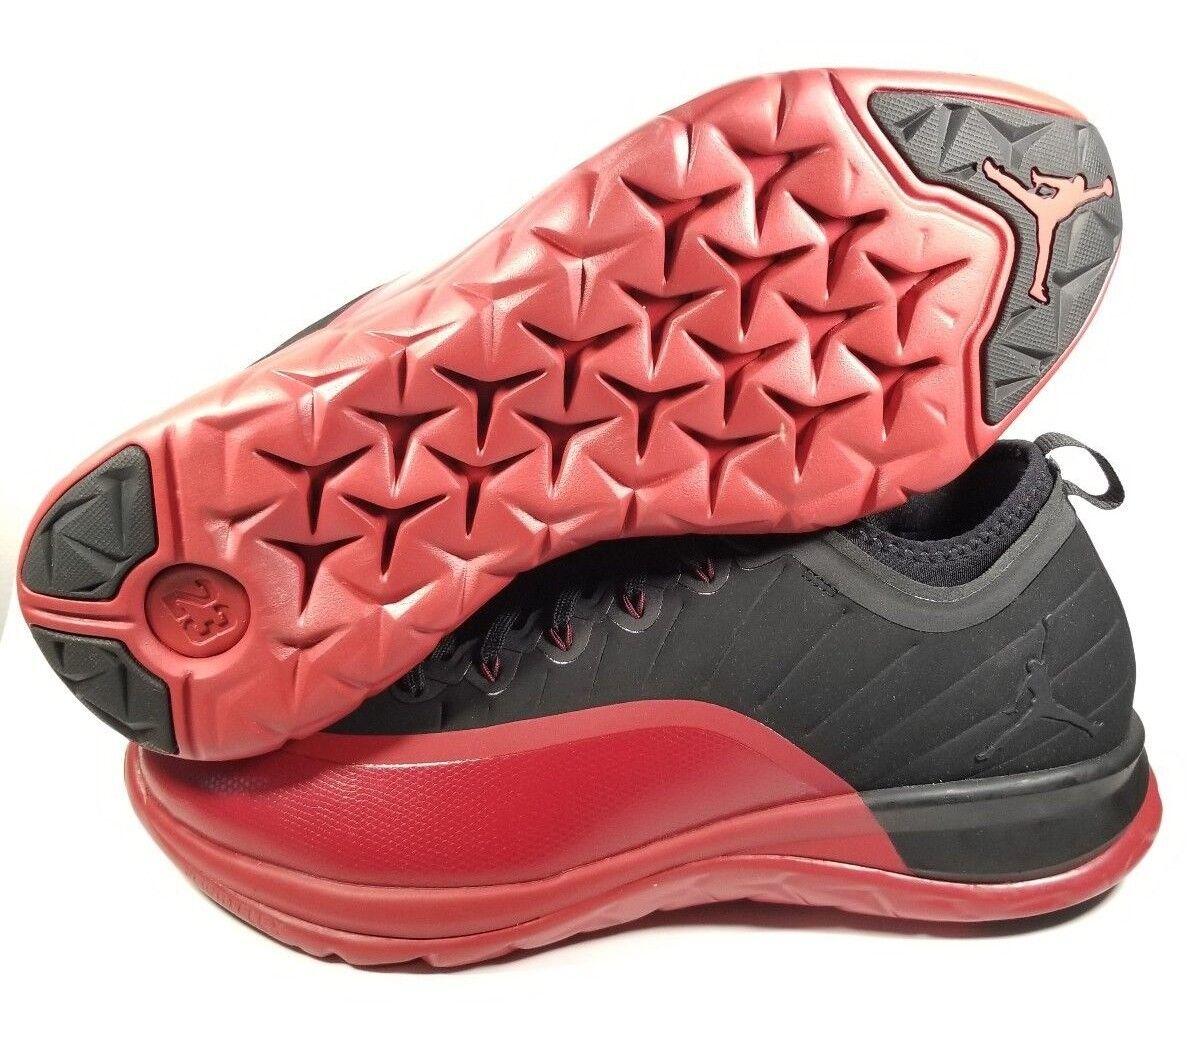 Jordan Trainer Prime Black - Red 881463 060 SZ 11,5